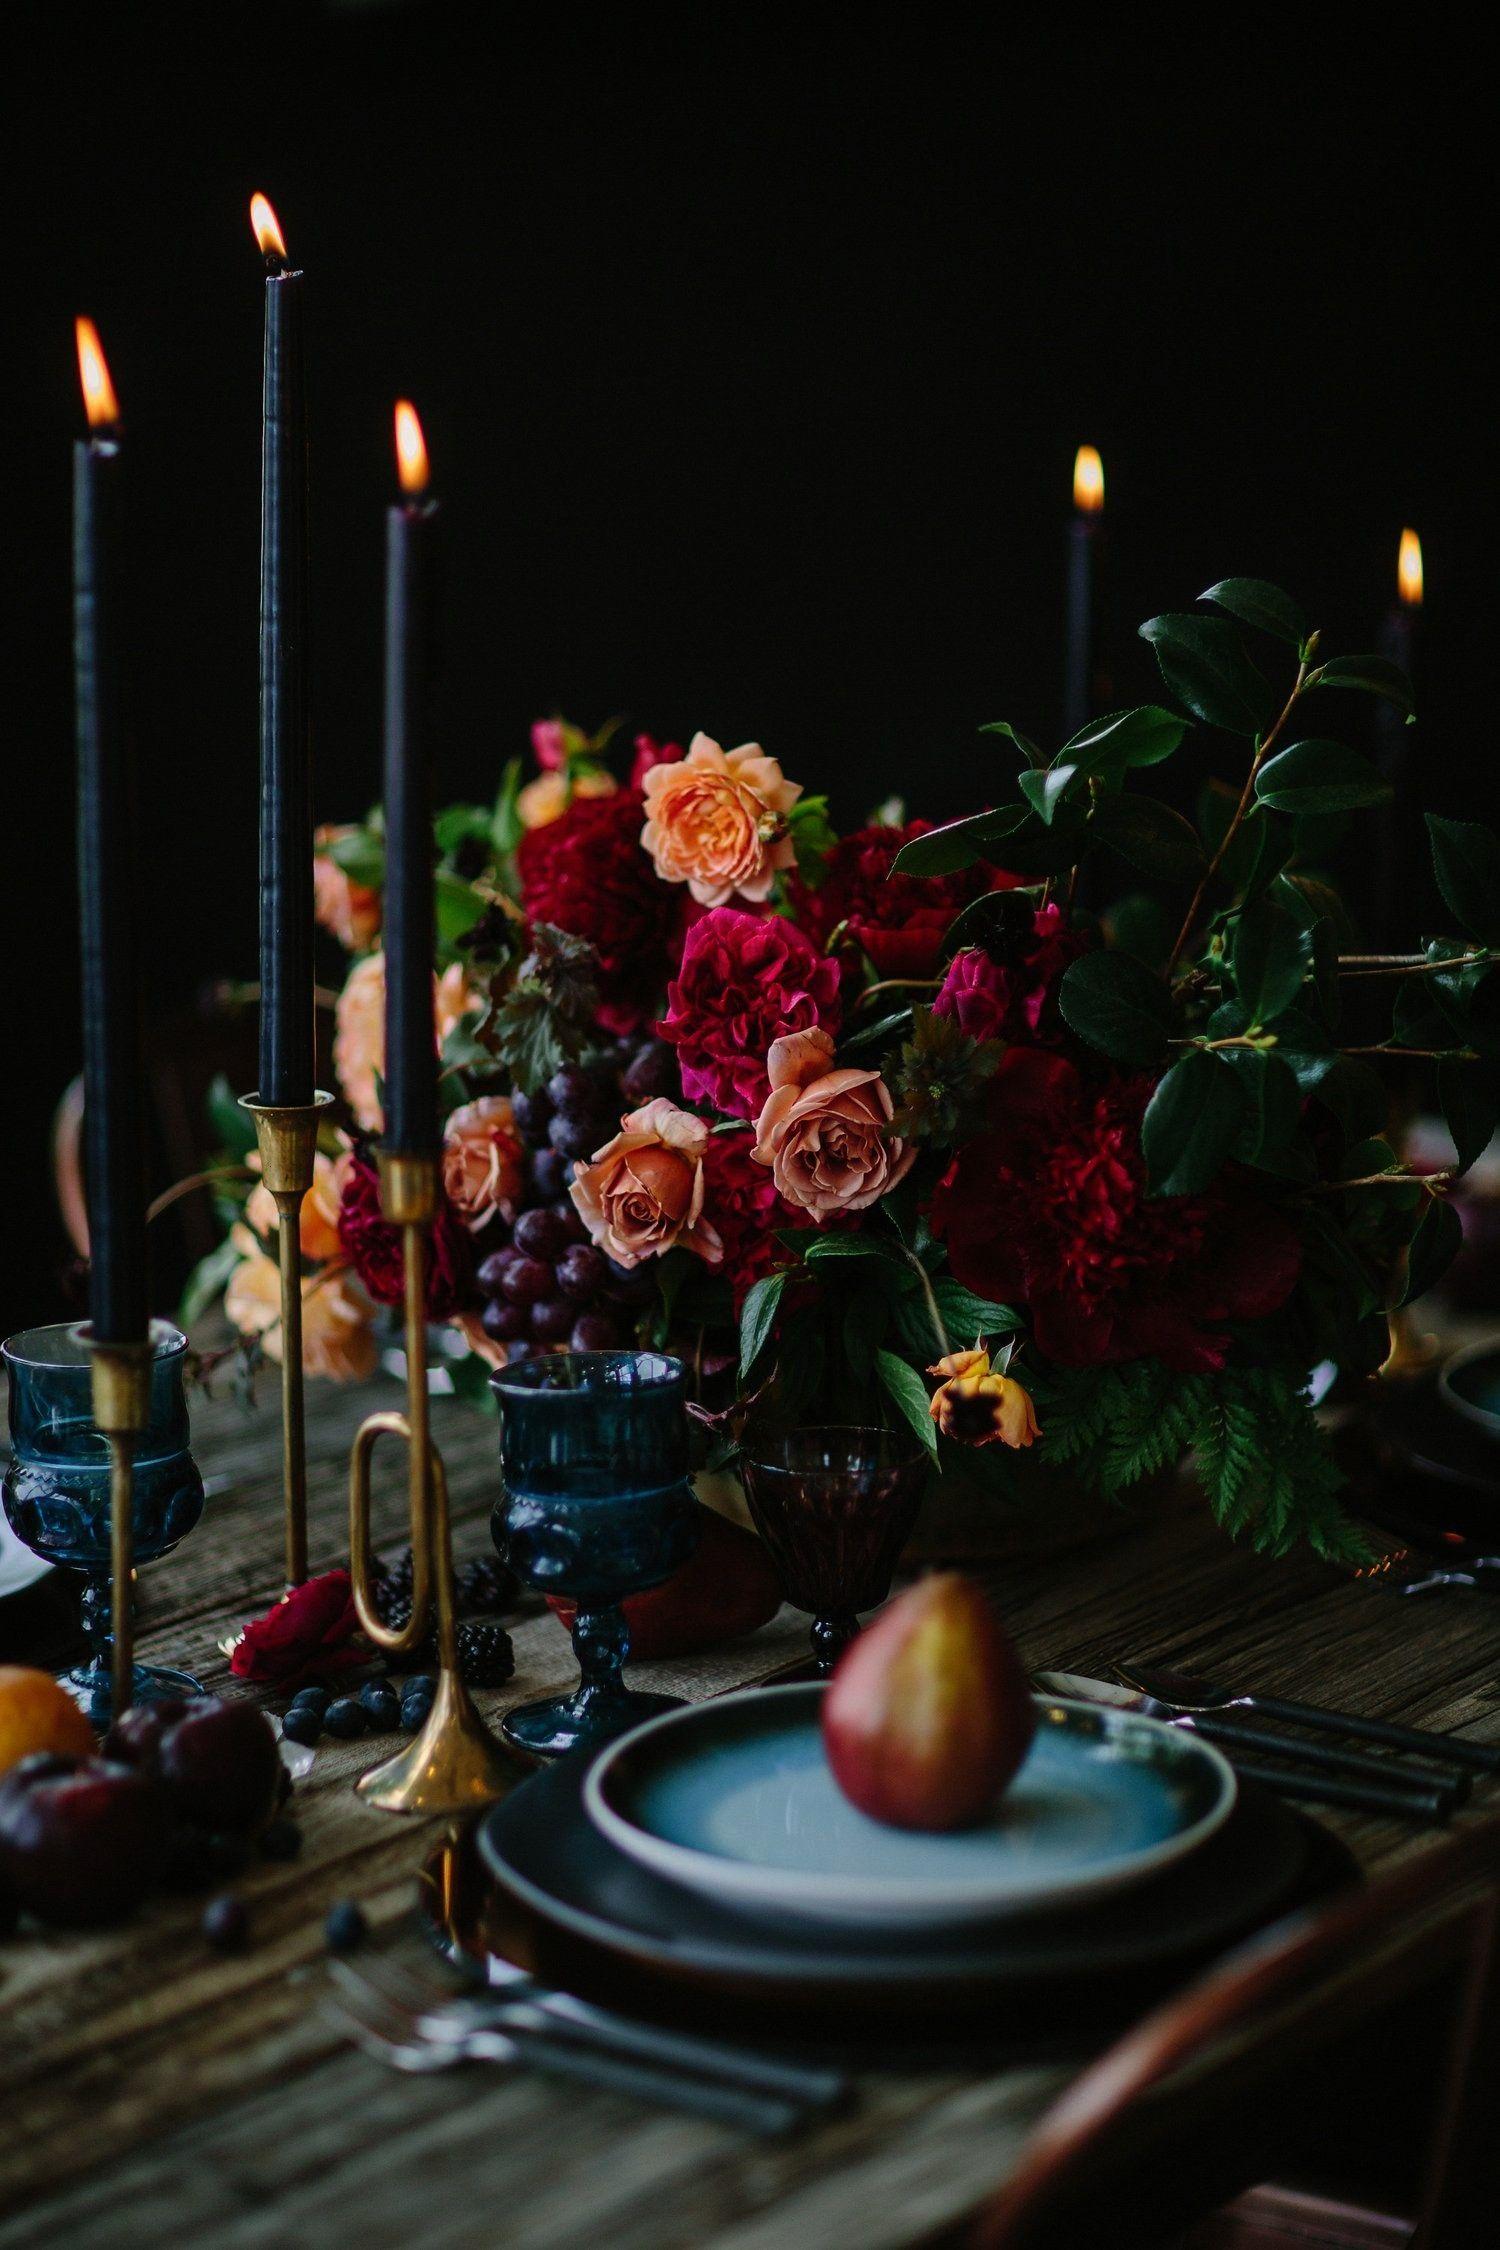 Winter Wedding Inspiration with Jewel Tones  Black Candles weddingrentals  Dark Winter Wedding Inspiration with Jewel Tones  Black Candles weddingrentals Dark Winter Wedd...